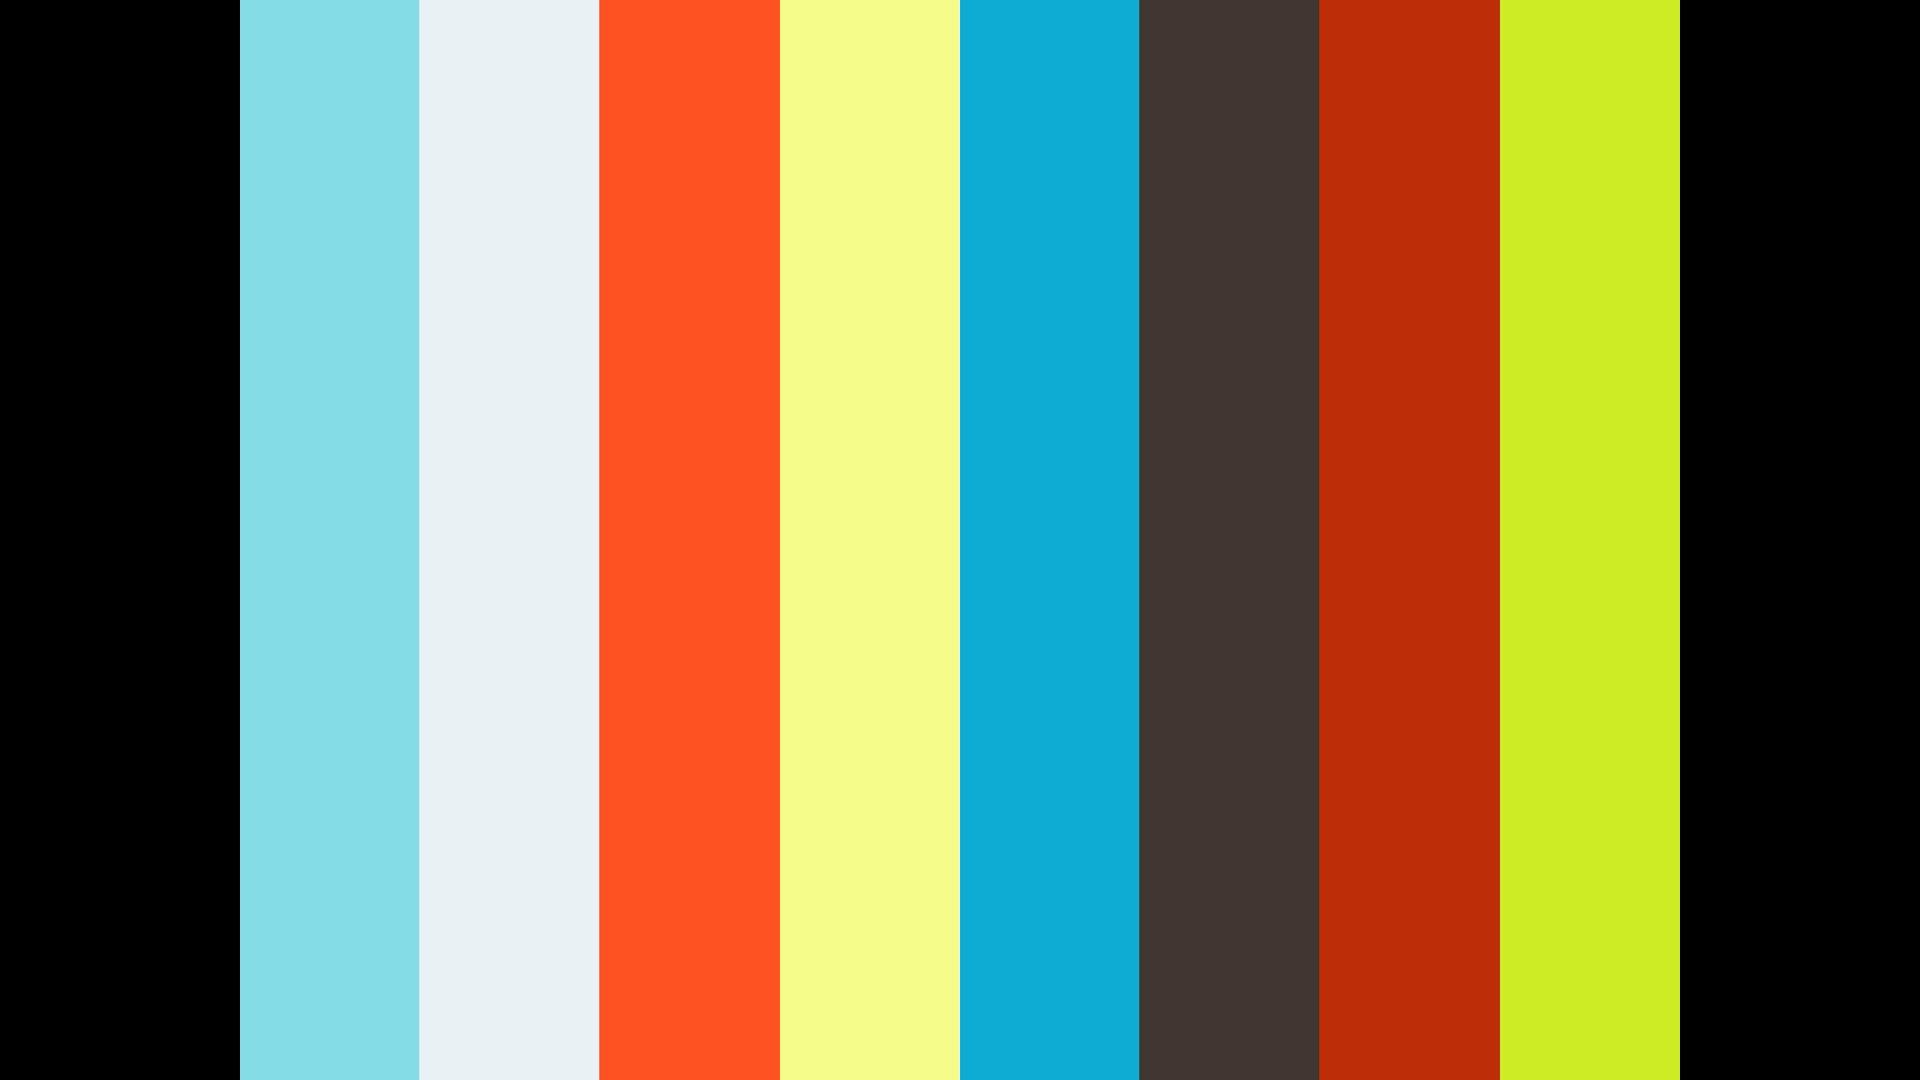 Dan Garfield, CodeFresh | KubeCon + CloudNativeCon San Diego 2019